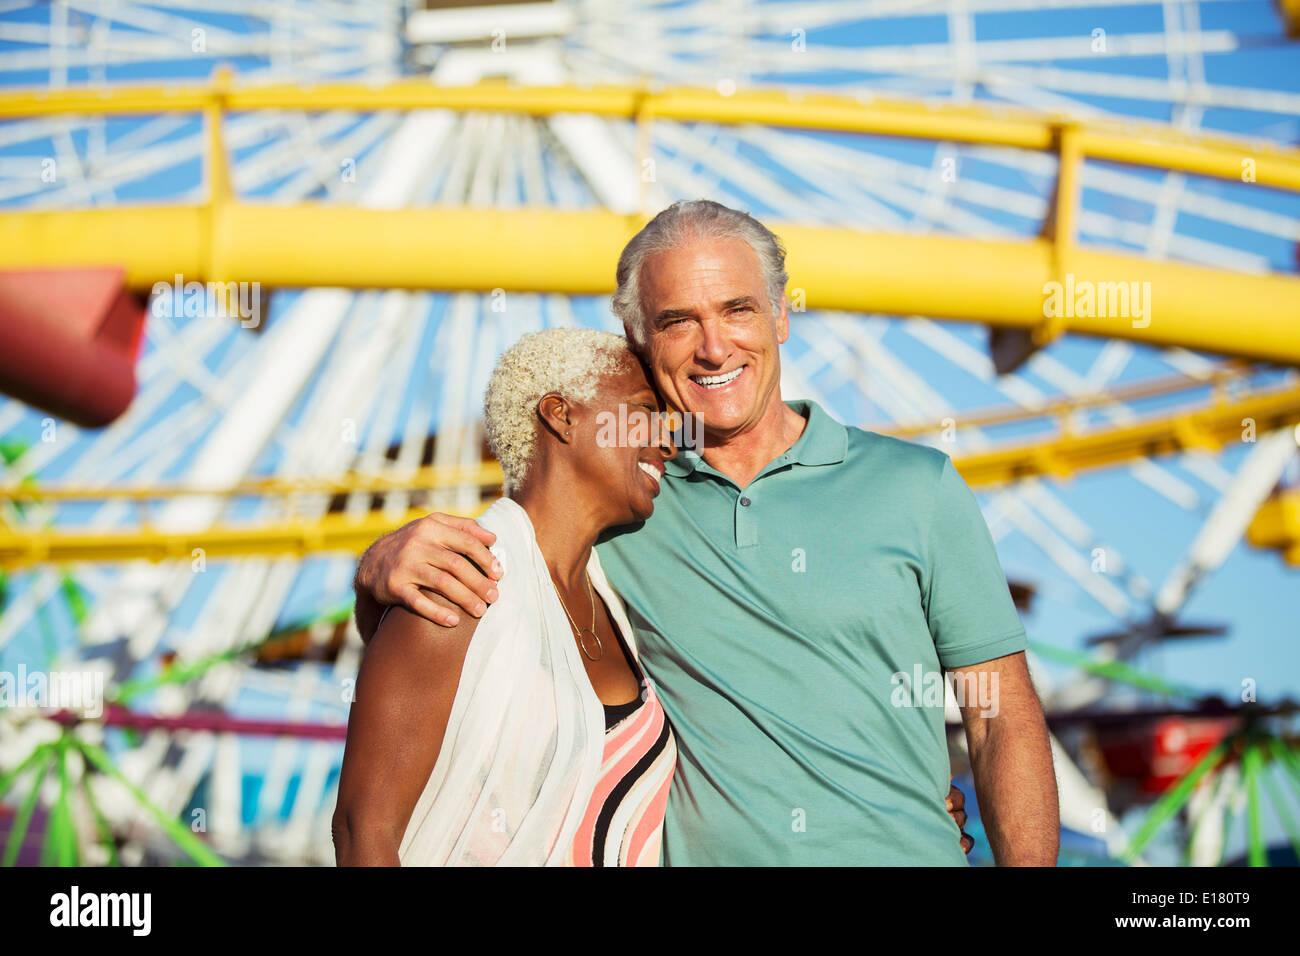 Portrait of hugging senior couple at amusement park - Stock Image